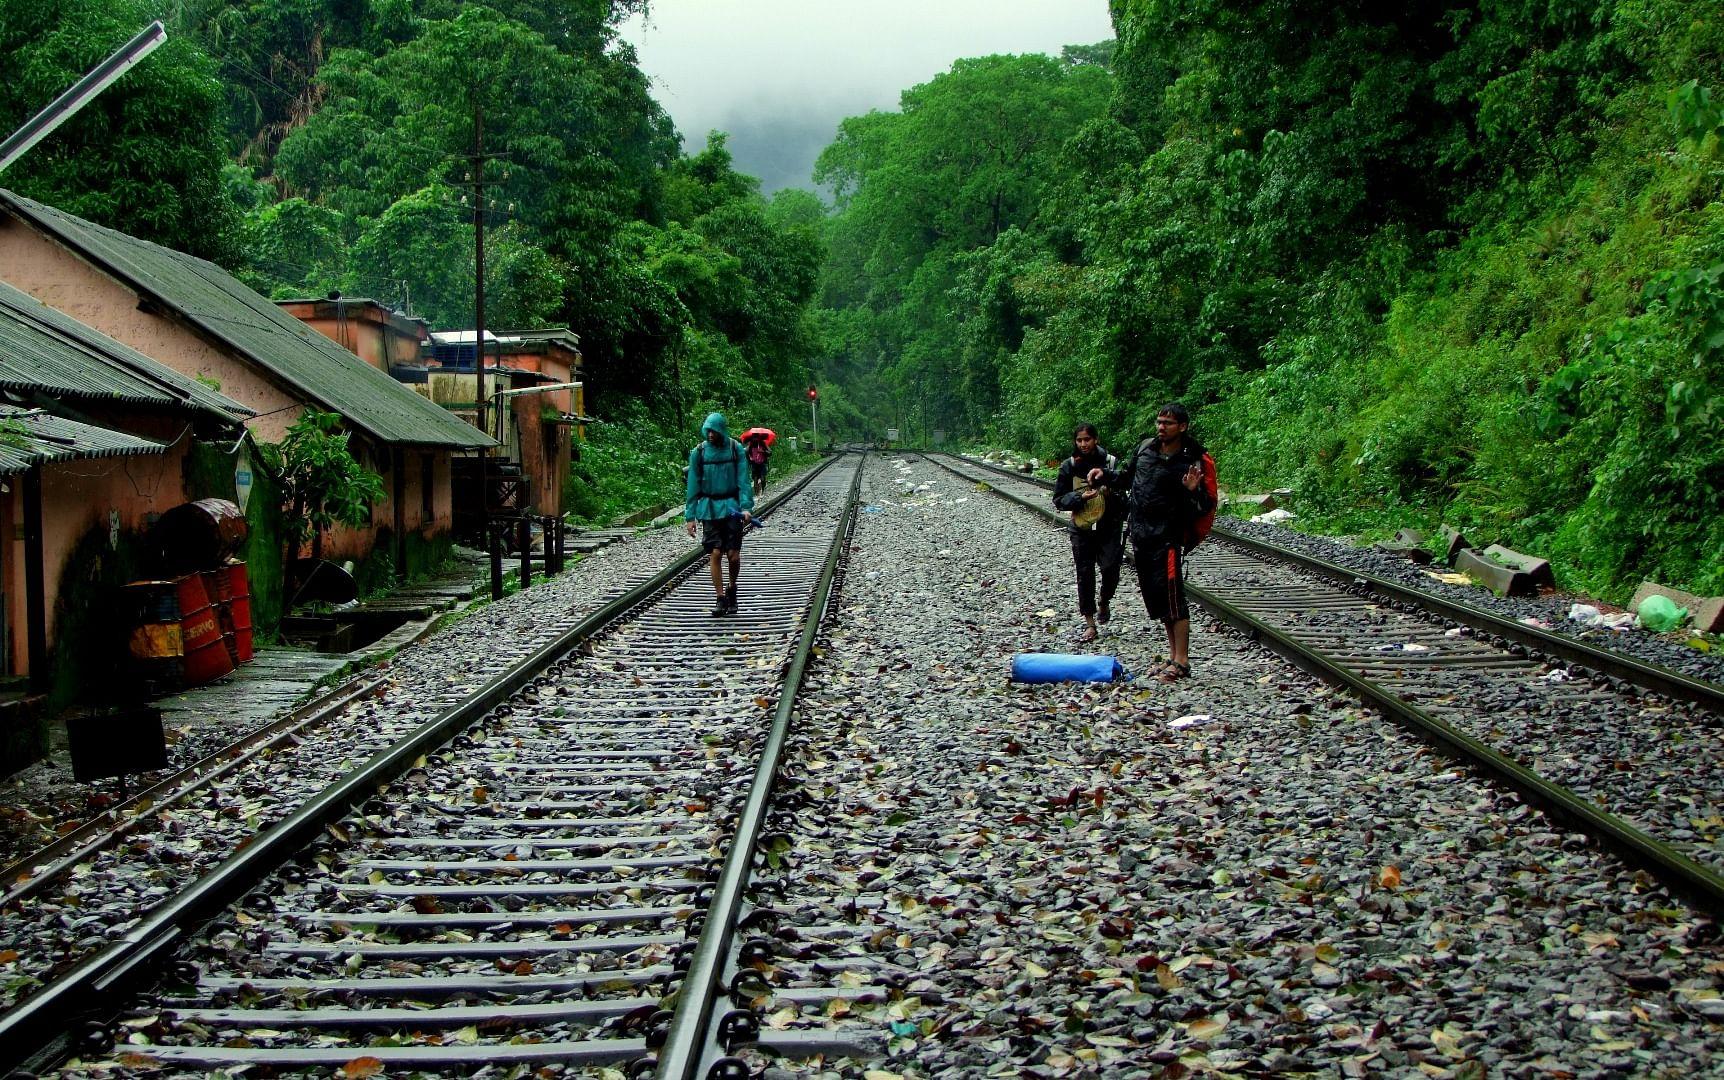 Monsoon magic along the track